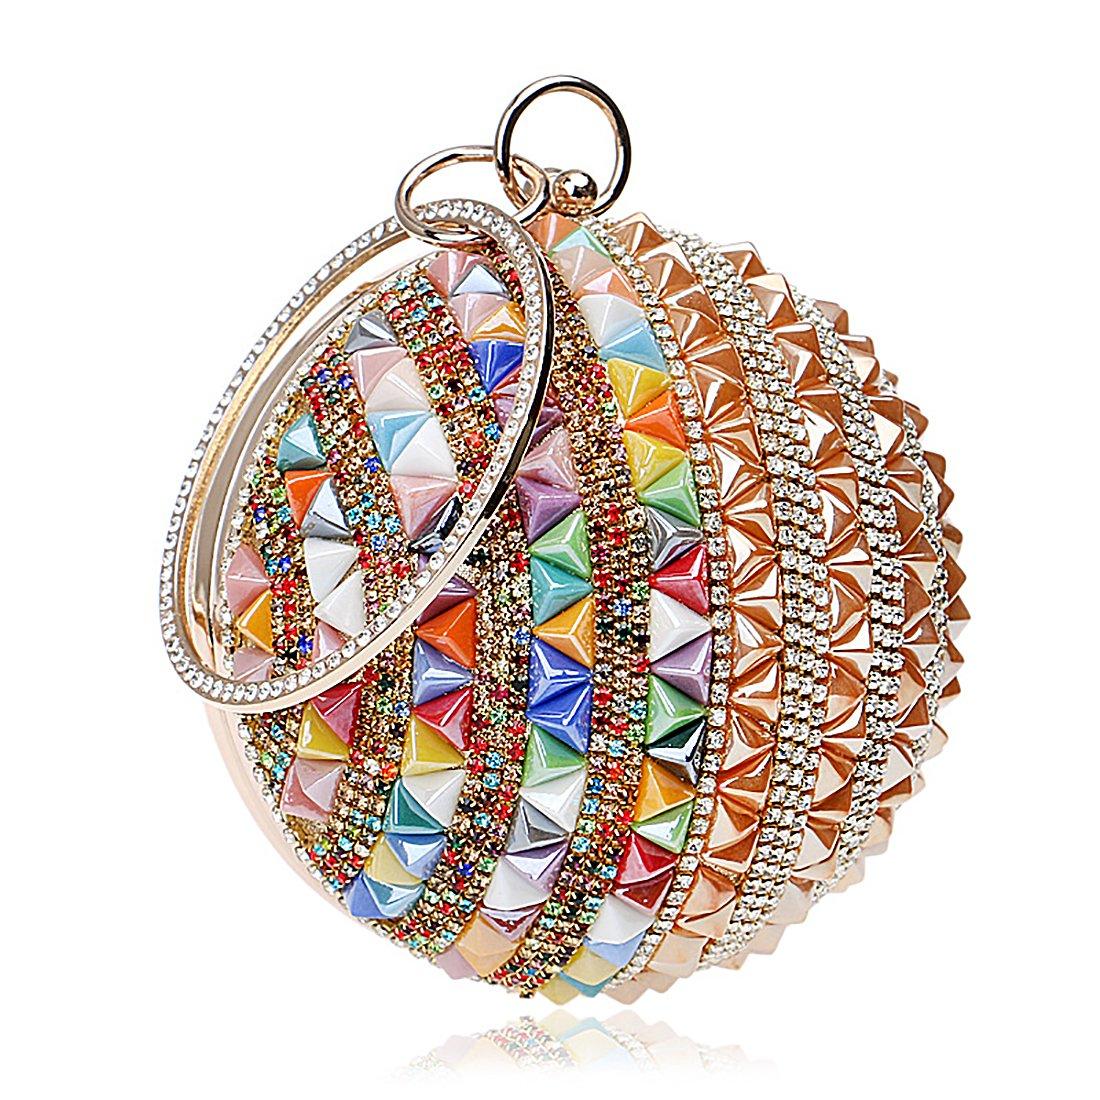 Woman Round Ball Clutch Handbag Rhinestone Ring Handle Purse Evening Bag (Multicolor 1)